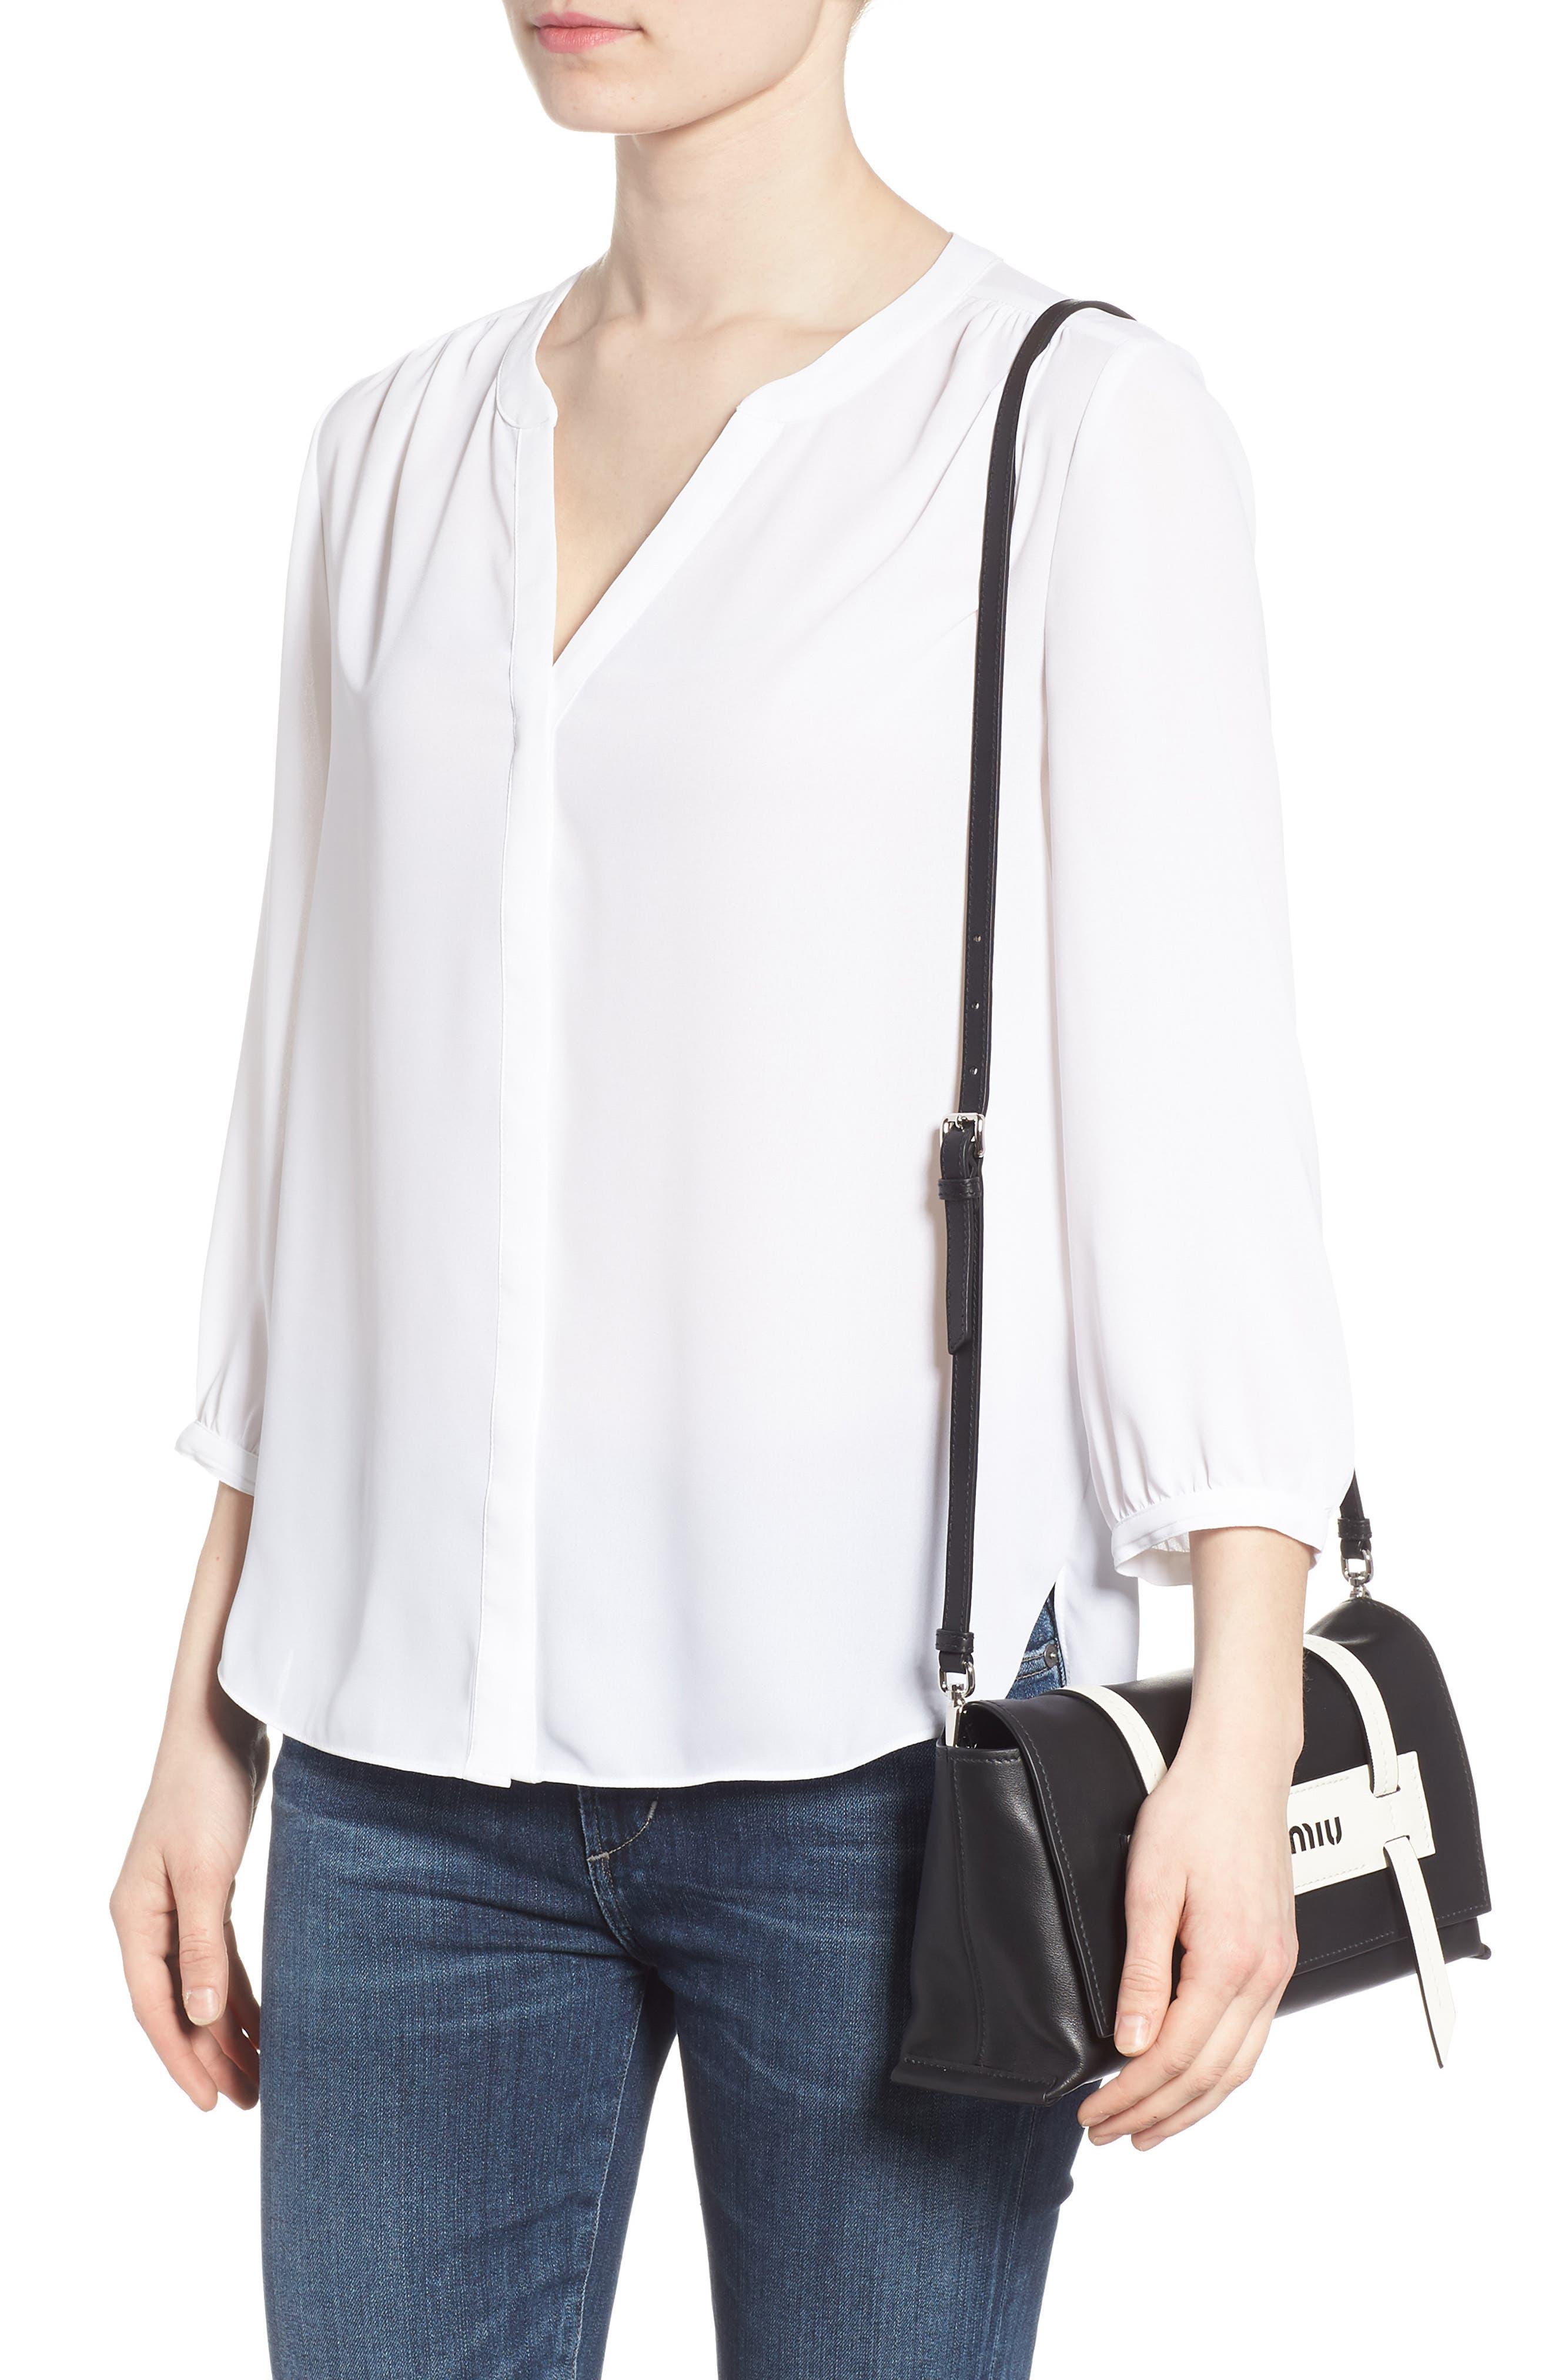 Small Grace Calfskin Shoulder Bag,                             Alternate thumbnail 2, color,                             NERO/ BIANCO